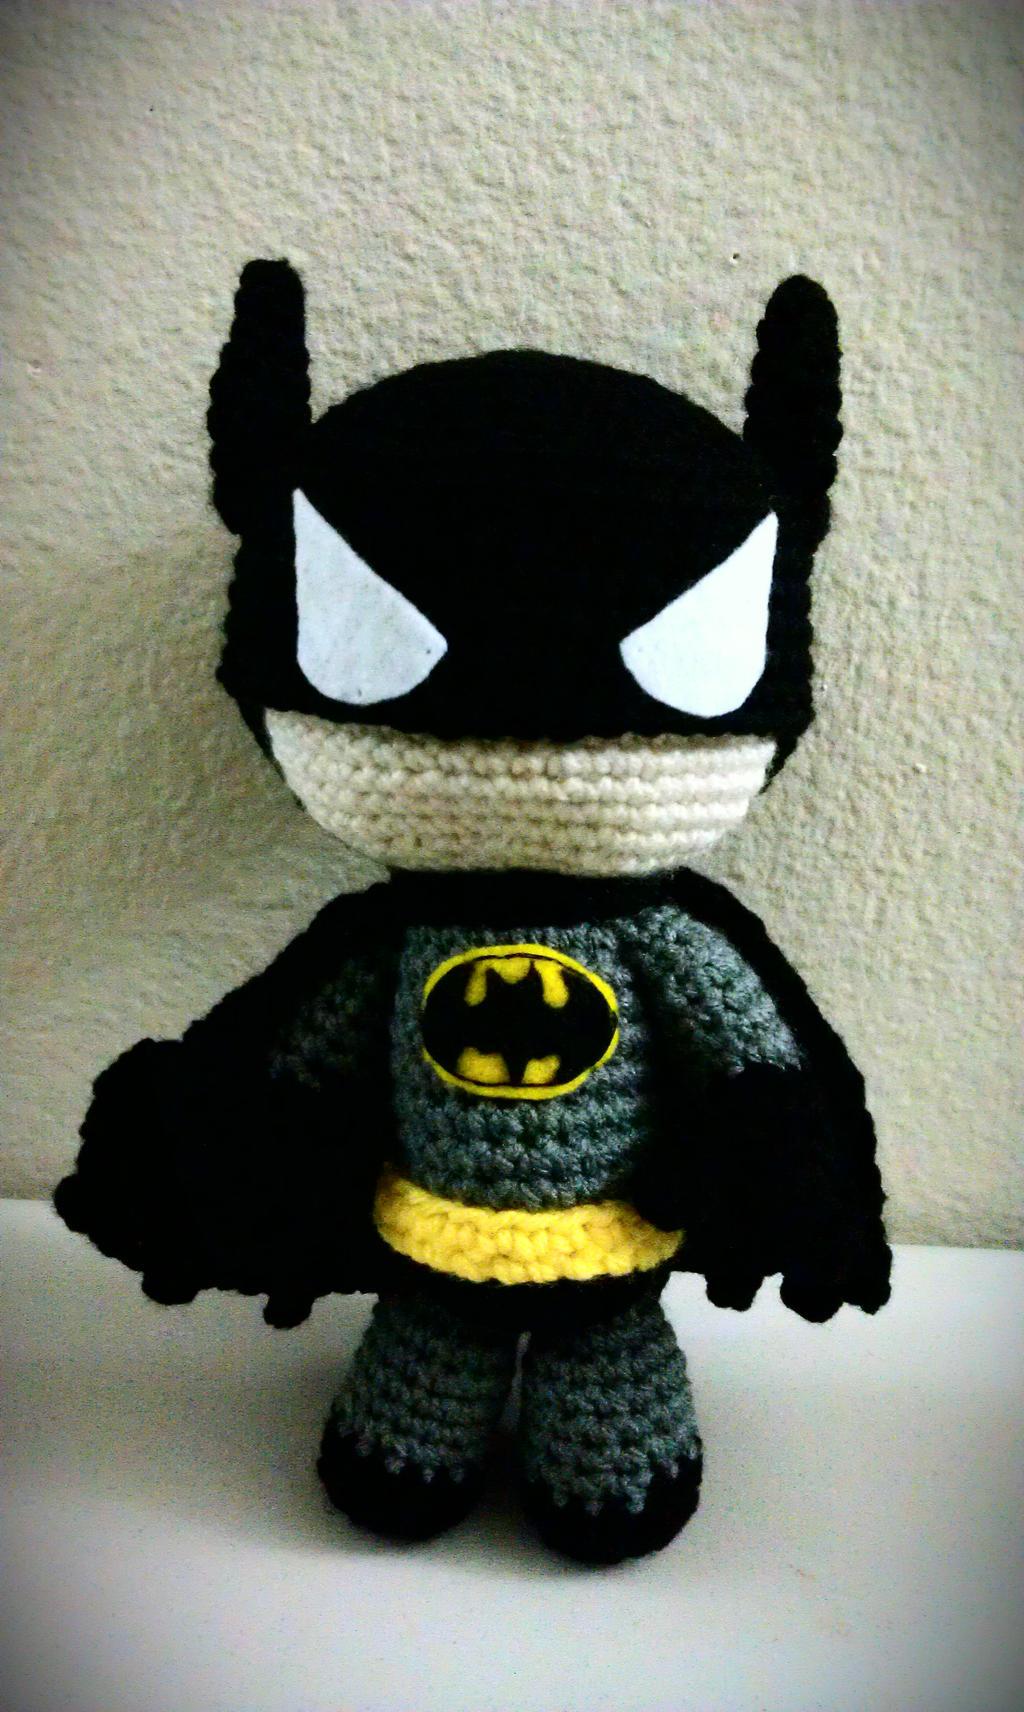 Batman Amigurumi Crochet Pattern Free : New Batman Sackboy! by LucreziaNatas on DeviantArt